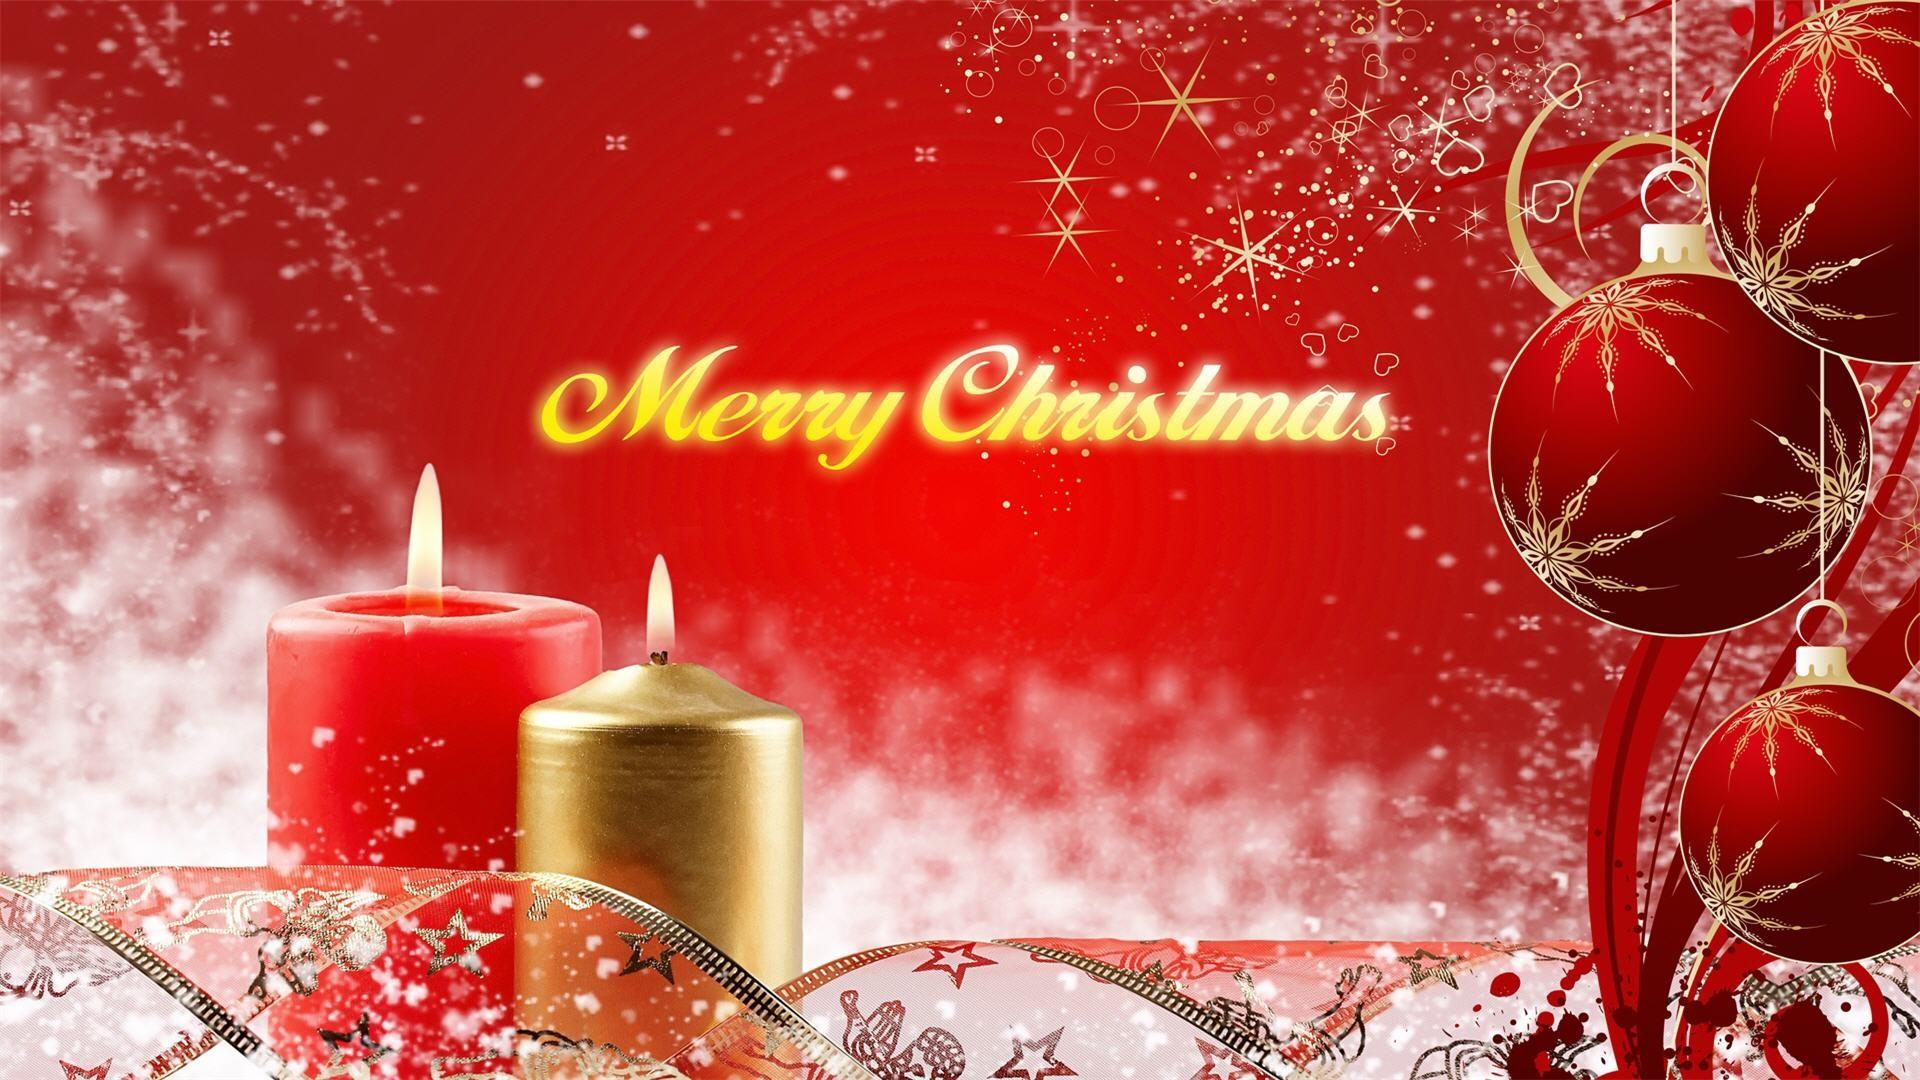 #3813279 px Christmas Wallpapers | Christmas Wallpapers Collection